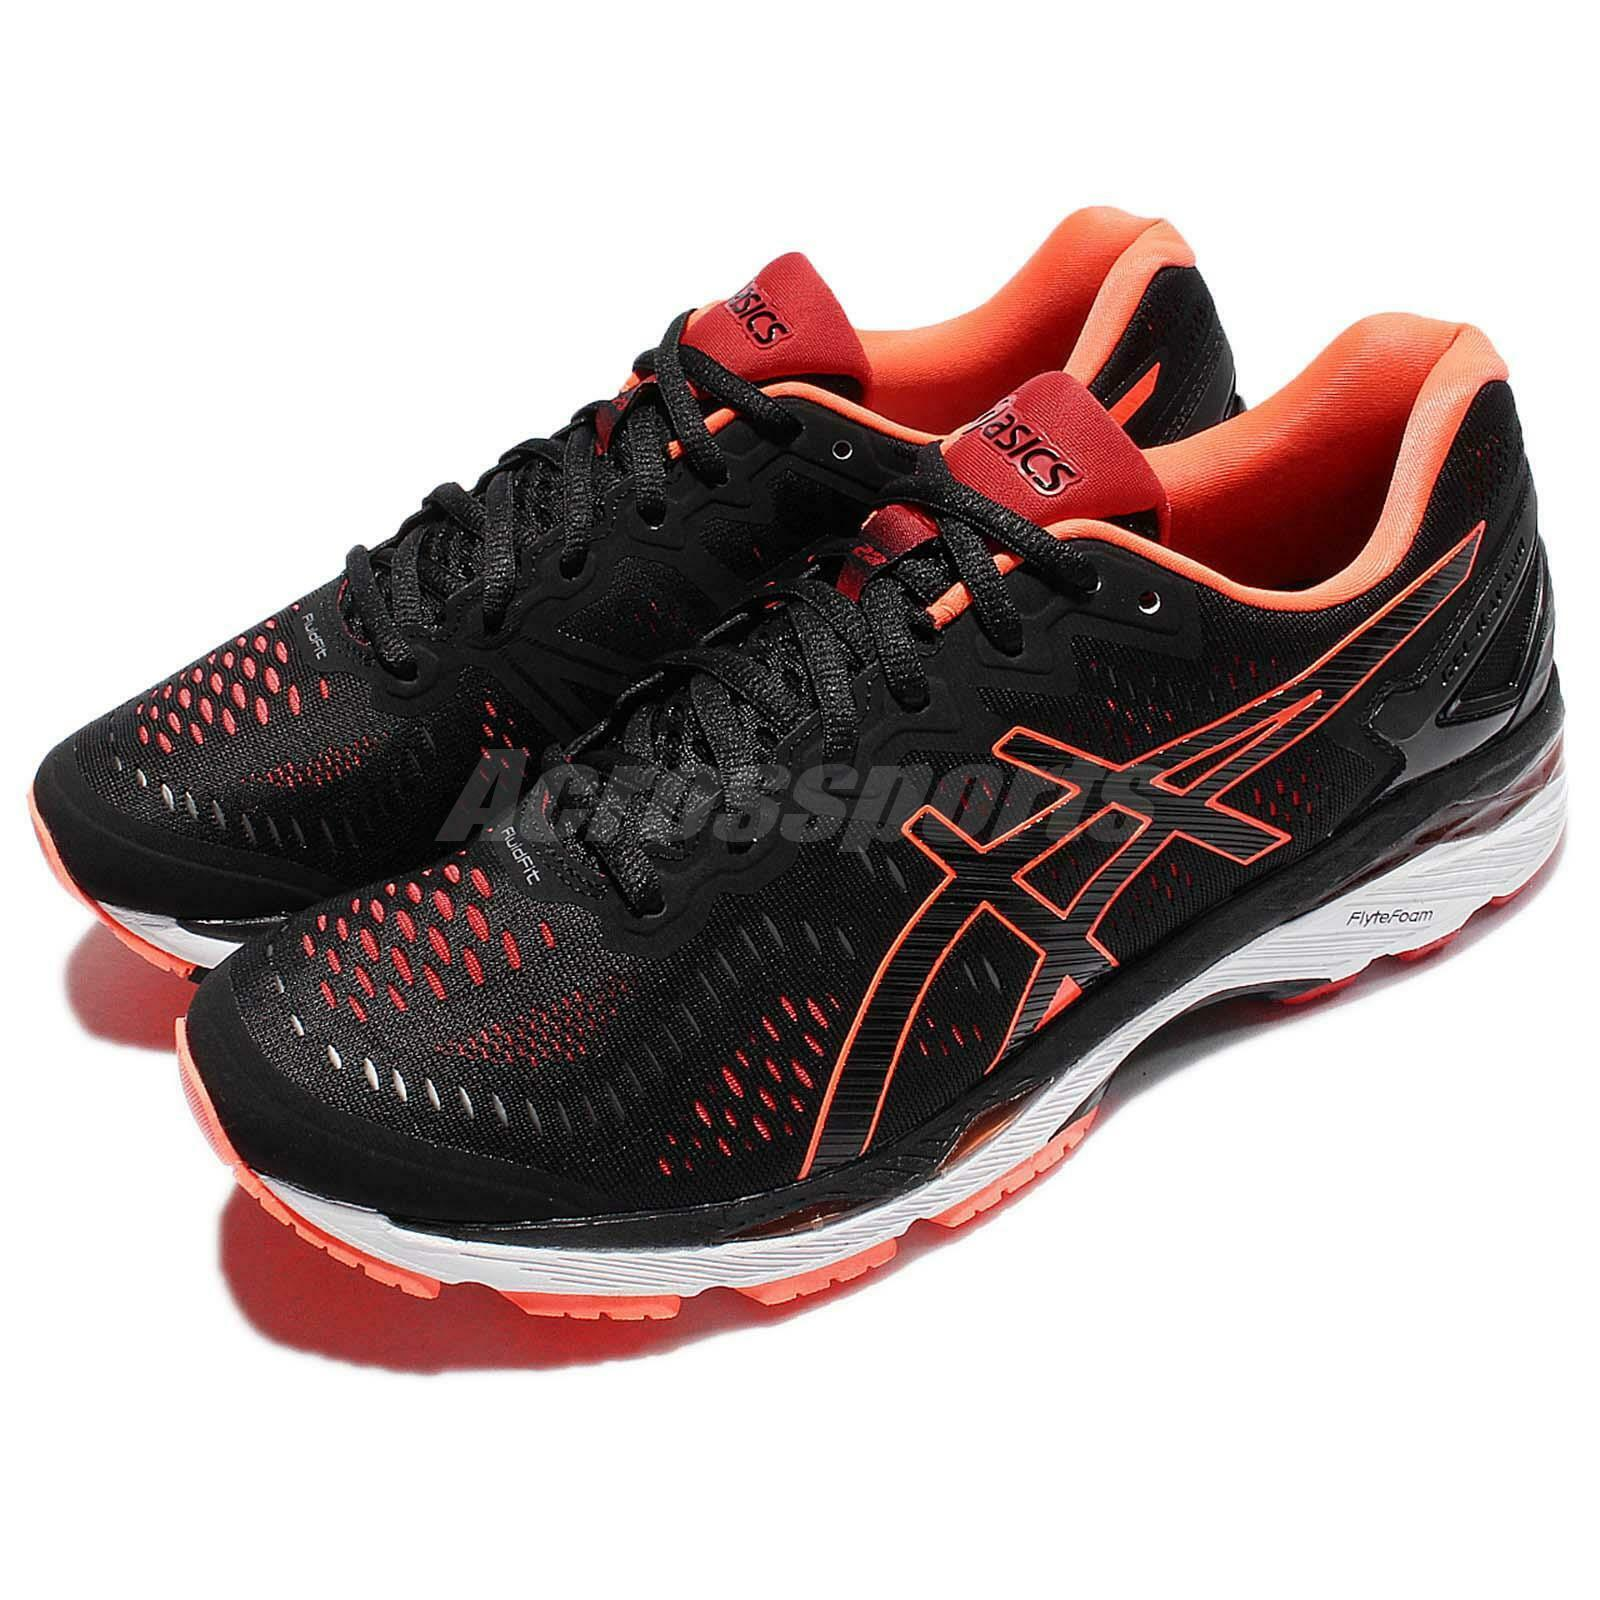 Asics Gel-Kayano 23 zwart oranje mannen hardlopen schoenen sportschoenen Trainers T646N-9030